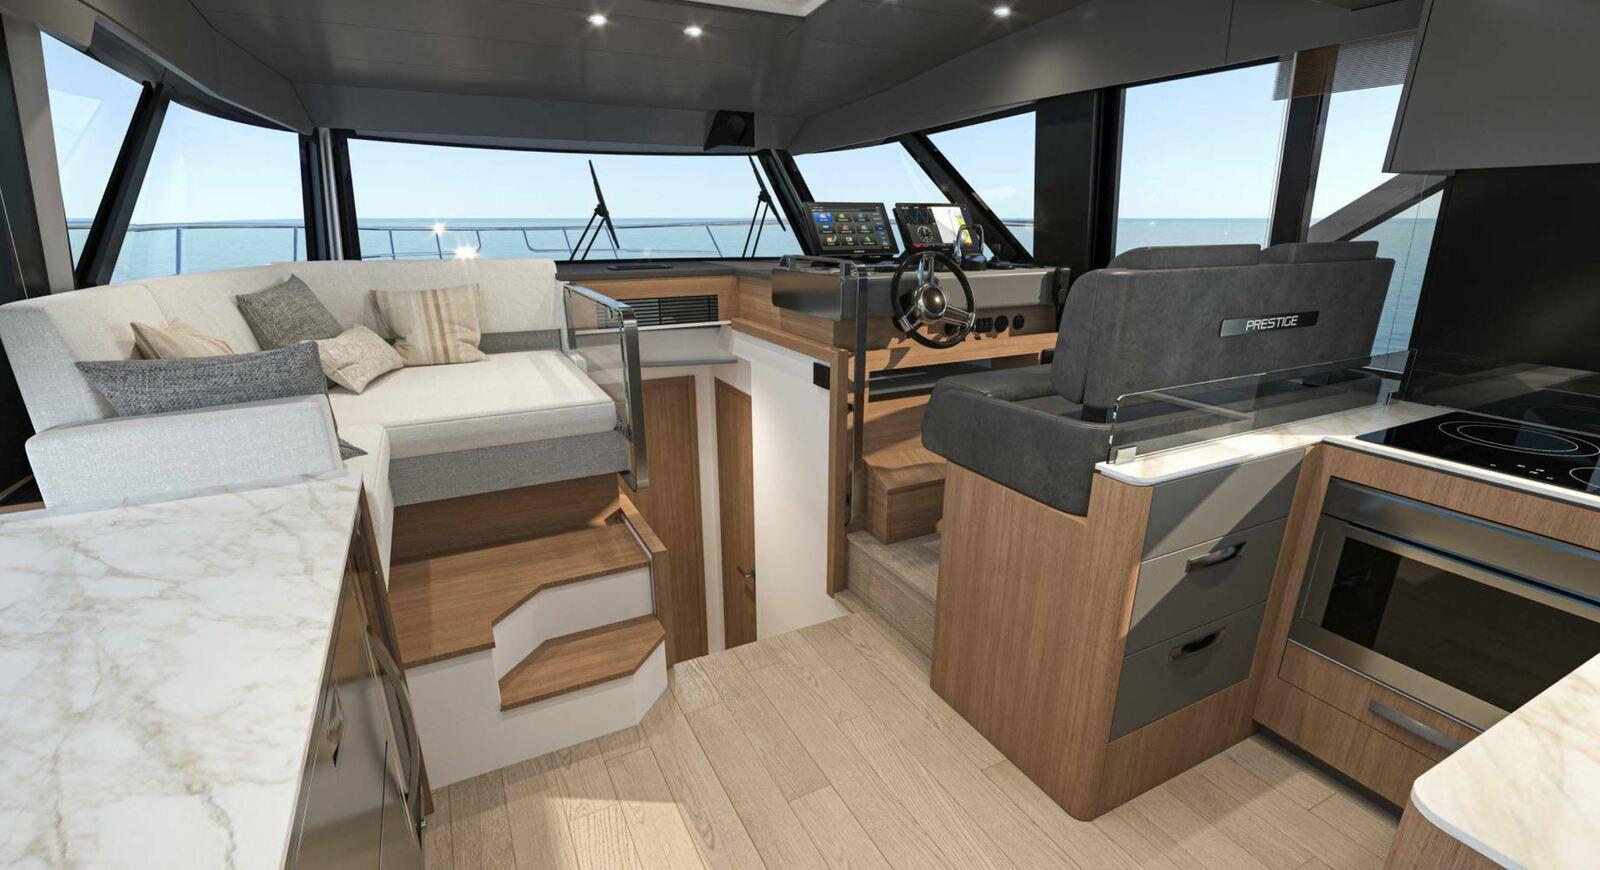 Motoryachting - the Prestige X60 expands the range of Prestige Yachts